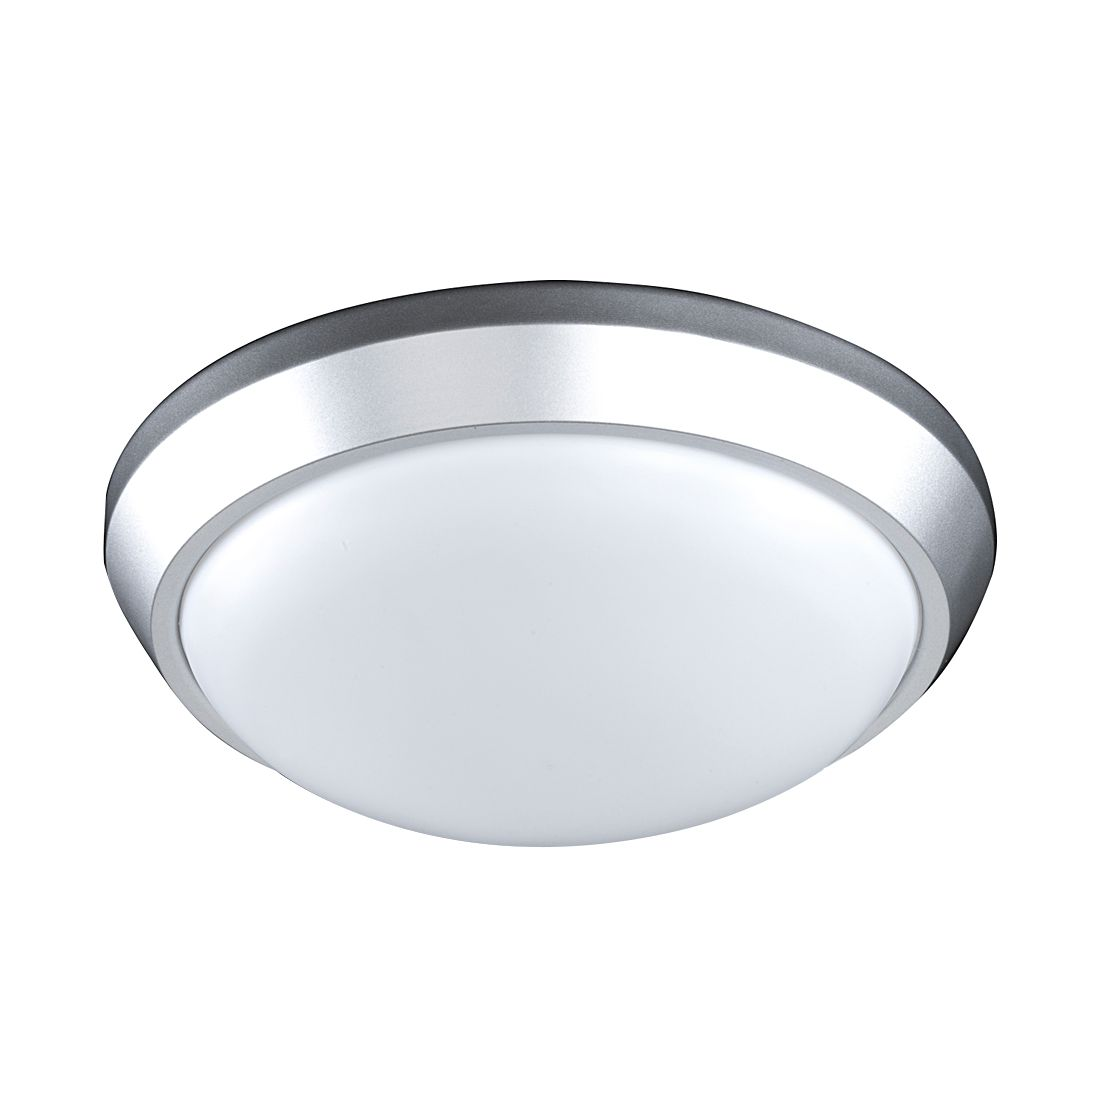 energie A+, Plafondlamp SANA metaal-kunststof 1 lichtbron, Action